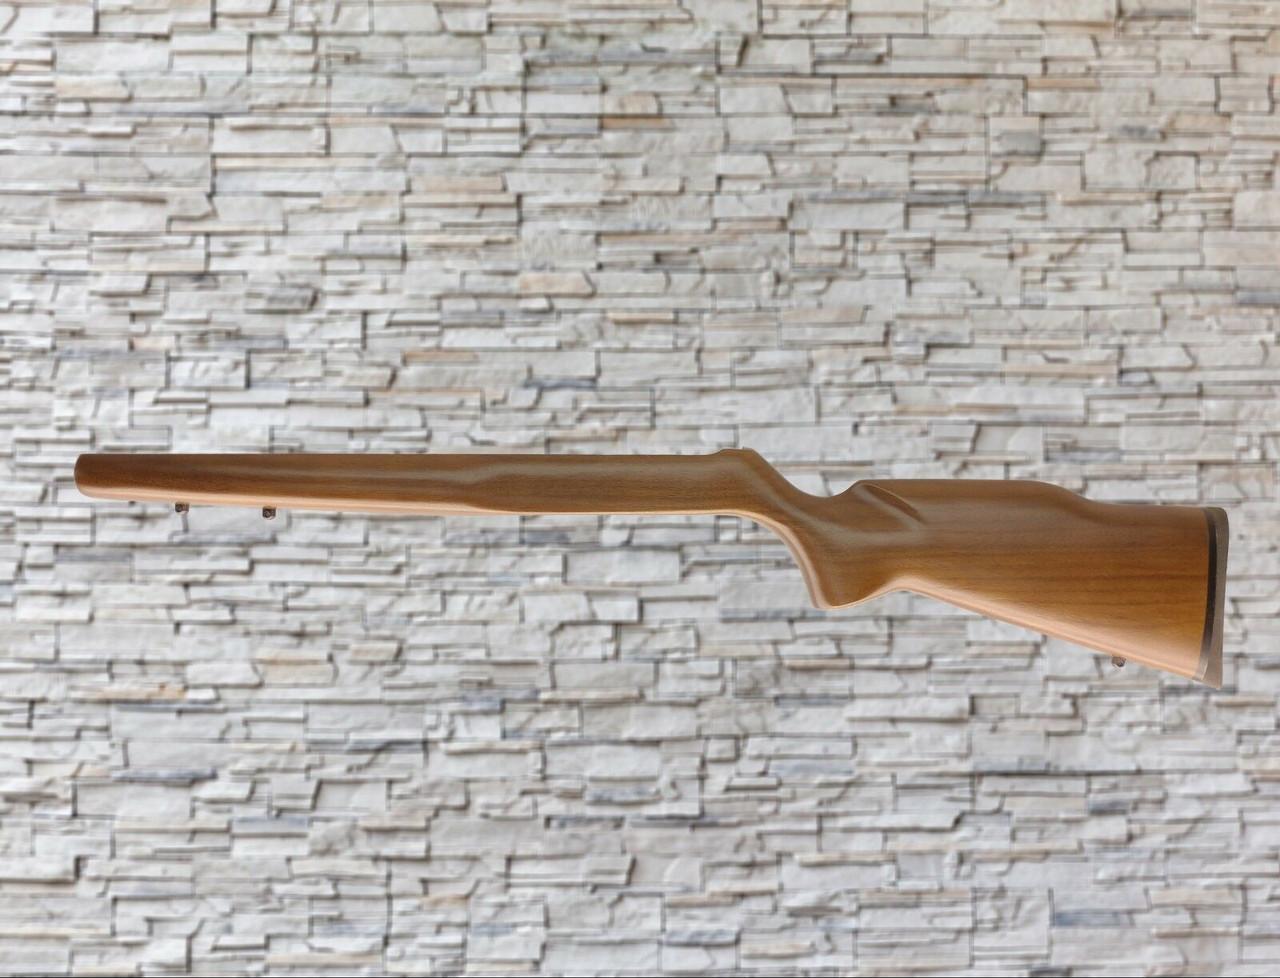 Boyds Rimfire Hunter Walnut Bull Barrel Wood Stock for Ruger 10/22, T/CR22